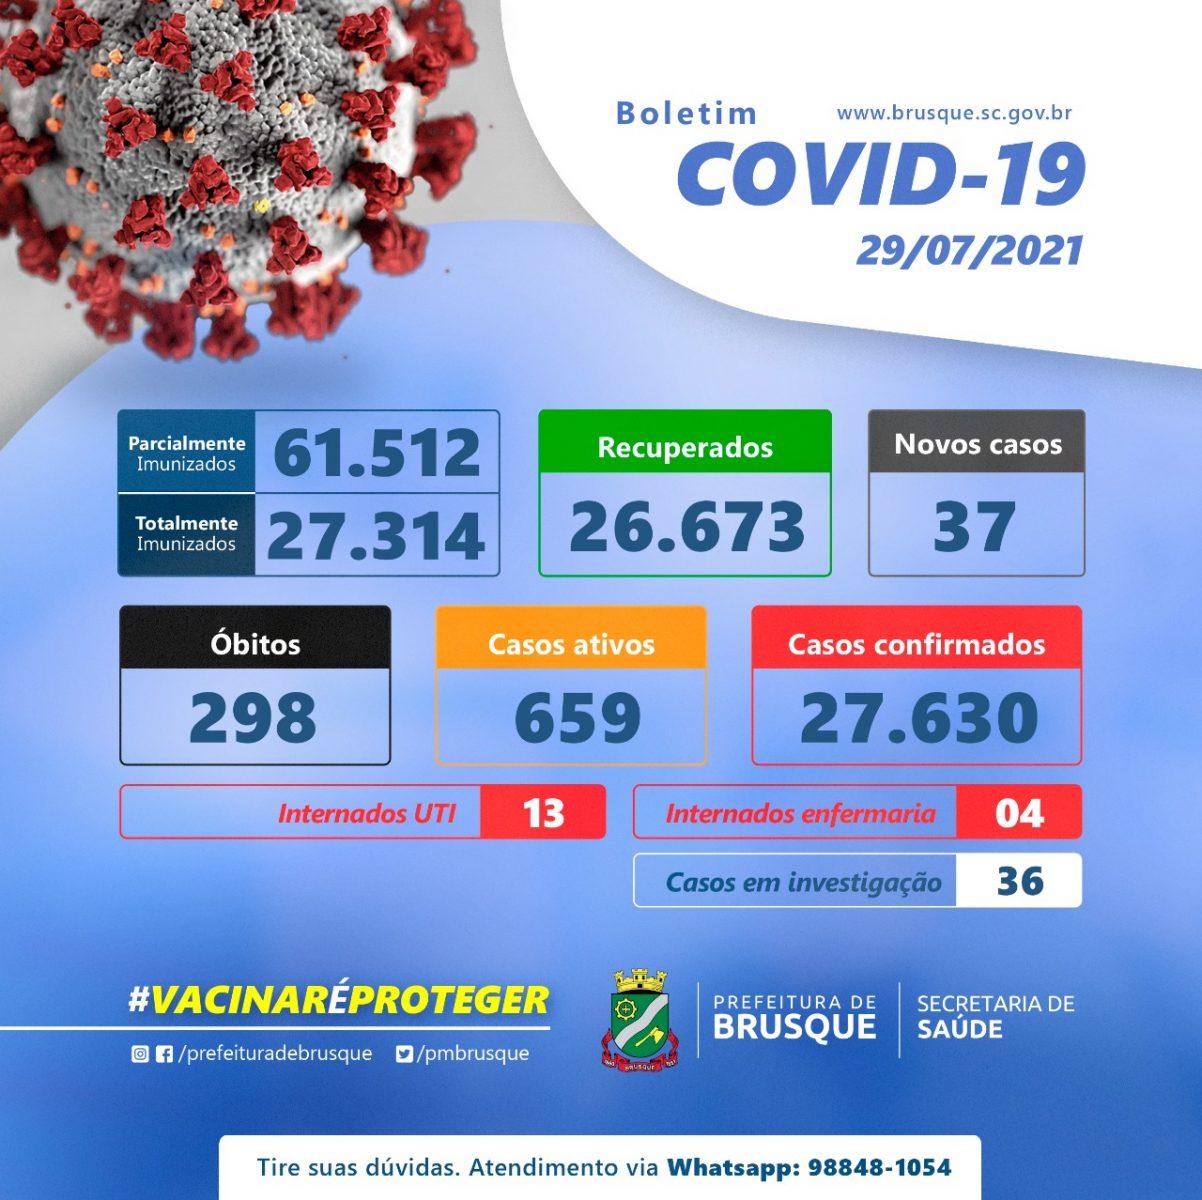 Covid-19: Confira o boletim epidemiológico desta quinta-feira (29)